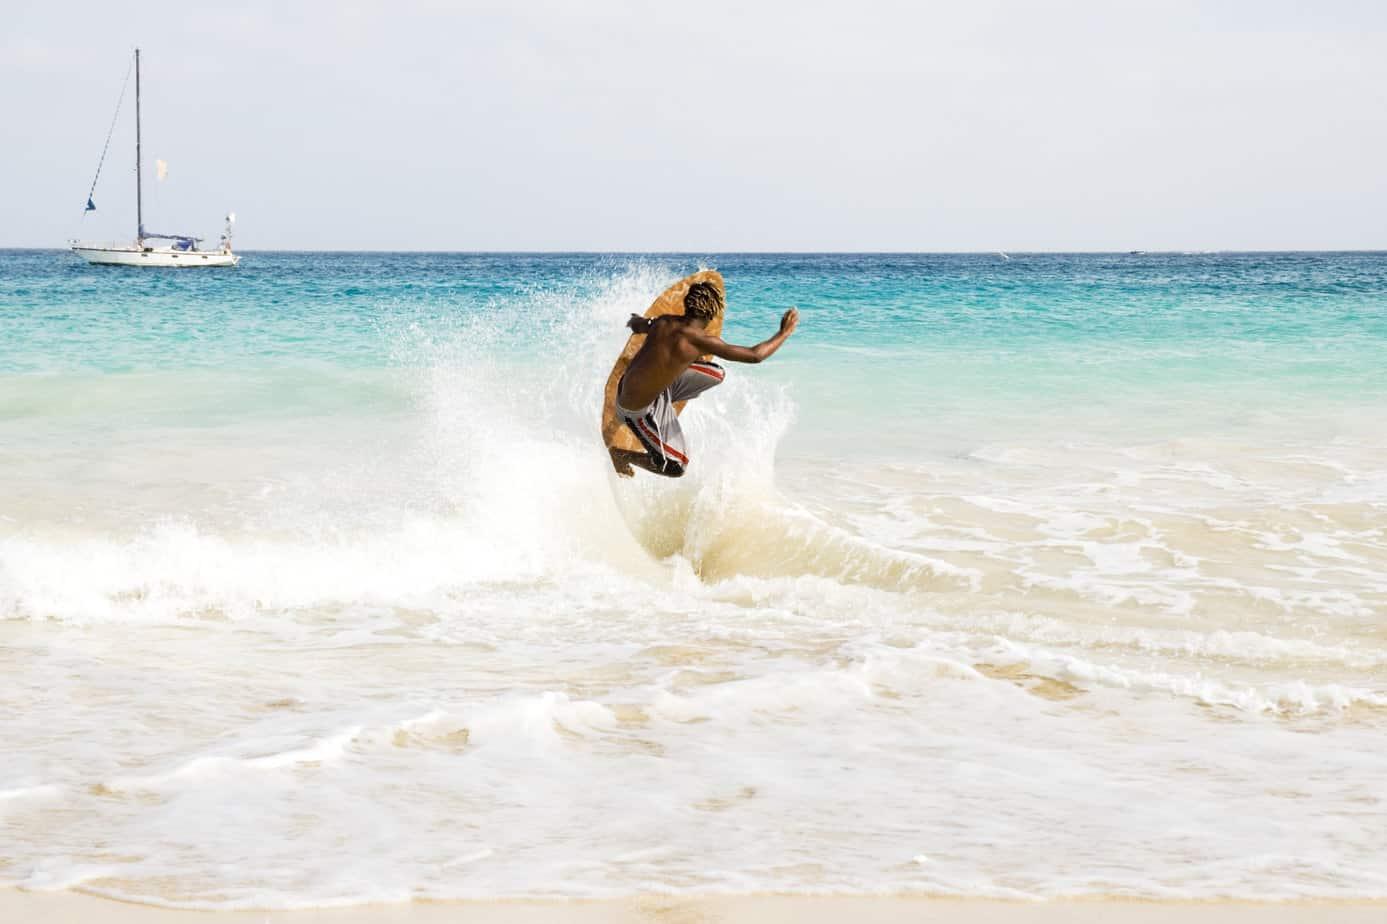 Surfer op de golven